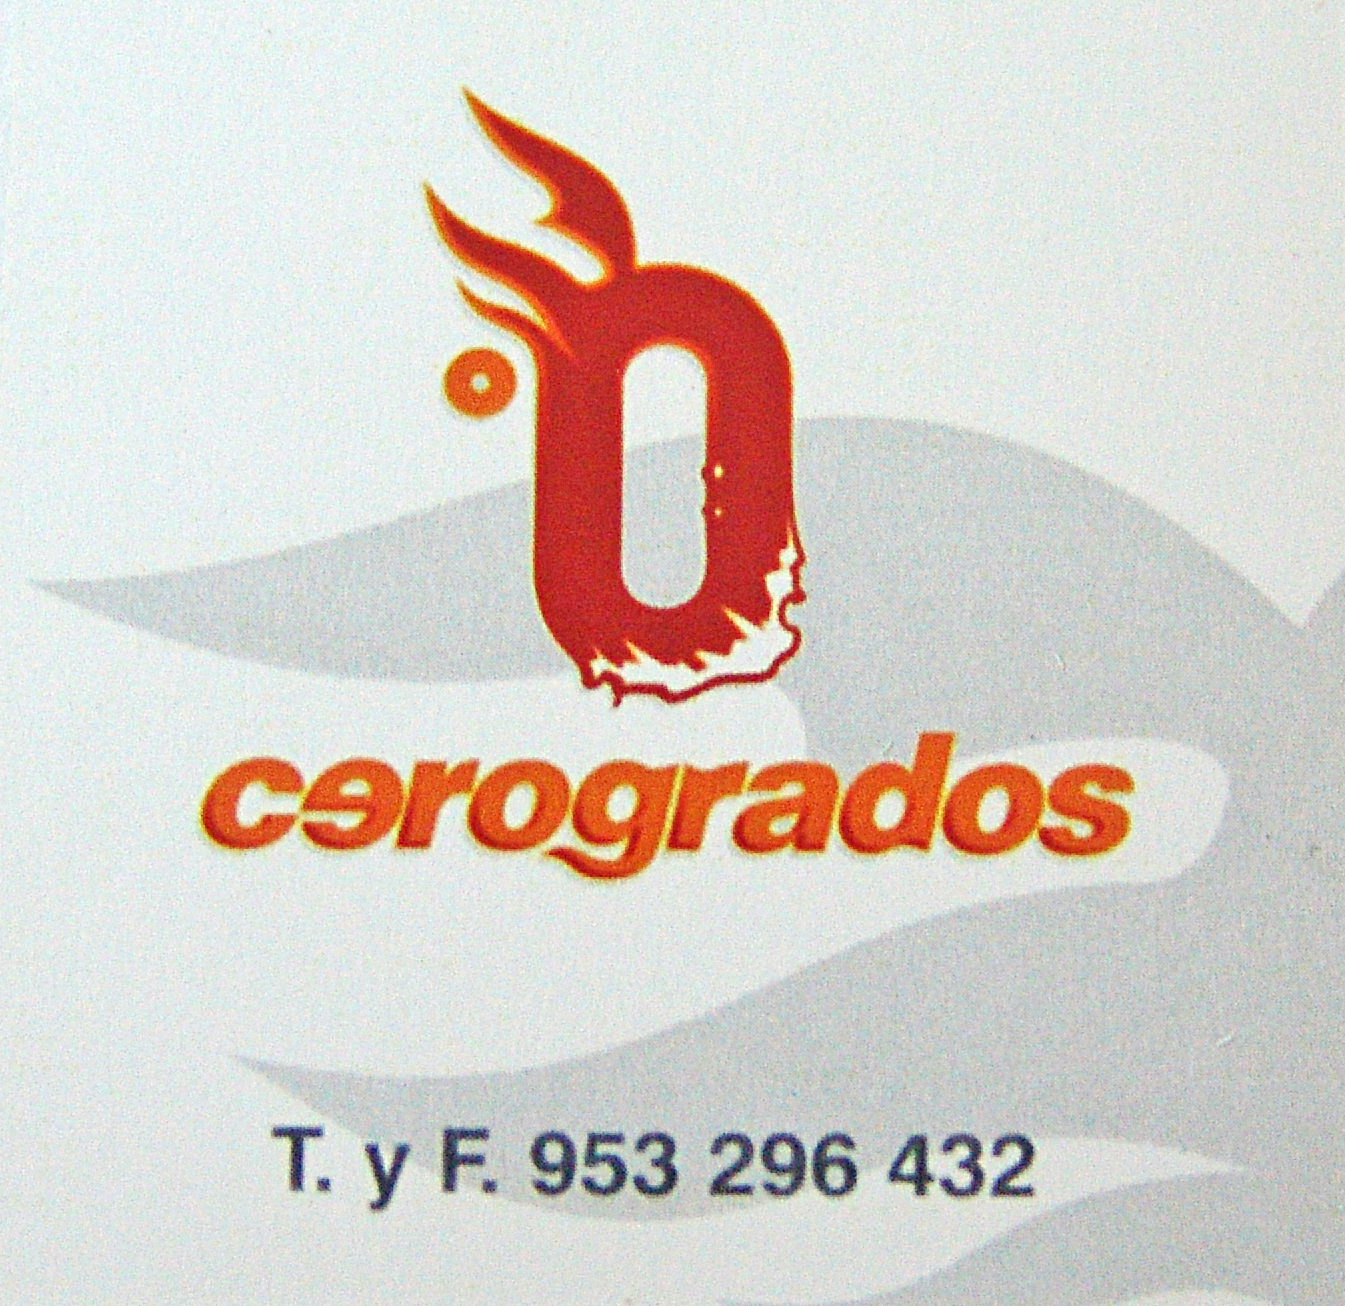 Cerogrados